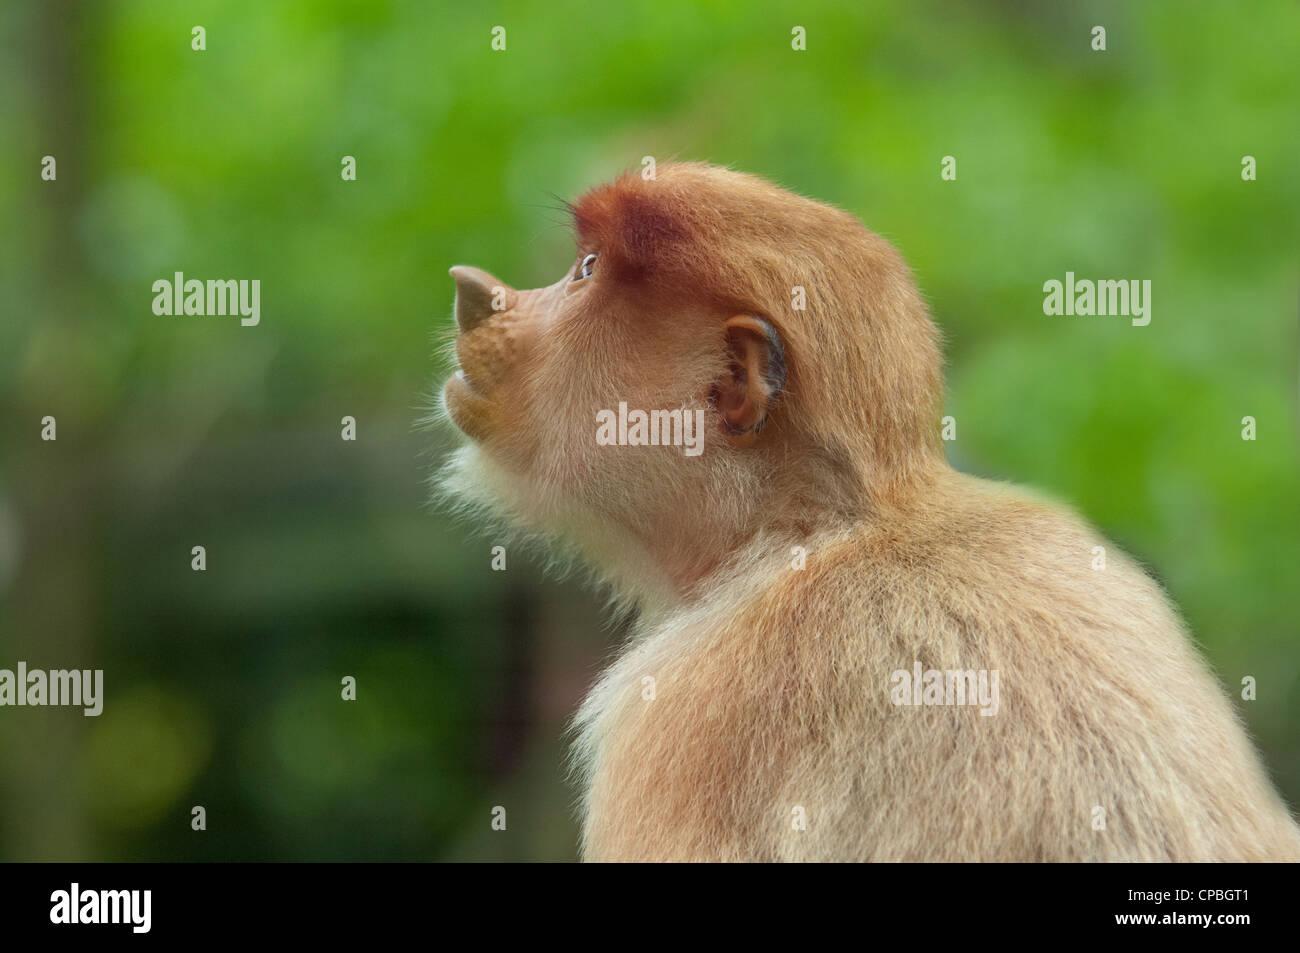 Malaysia, Island of Borneo, Sabah, Kota Kinabalu, Lok Kawi Wildlife Park. Proboscis monkey. - Stock Image